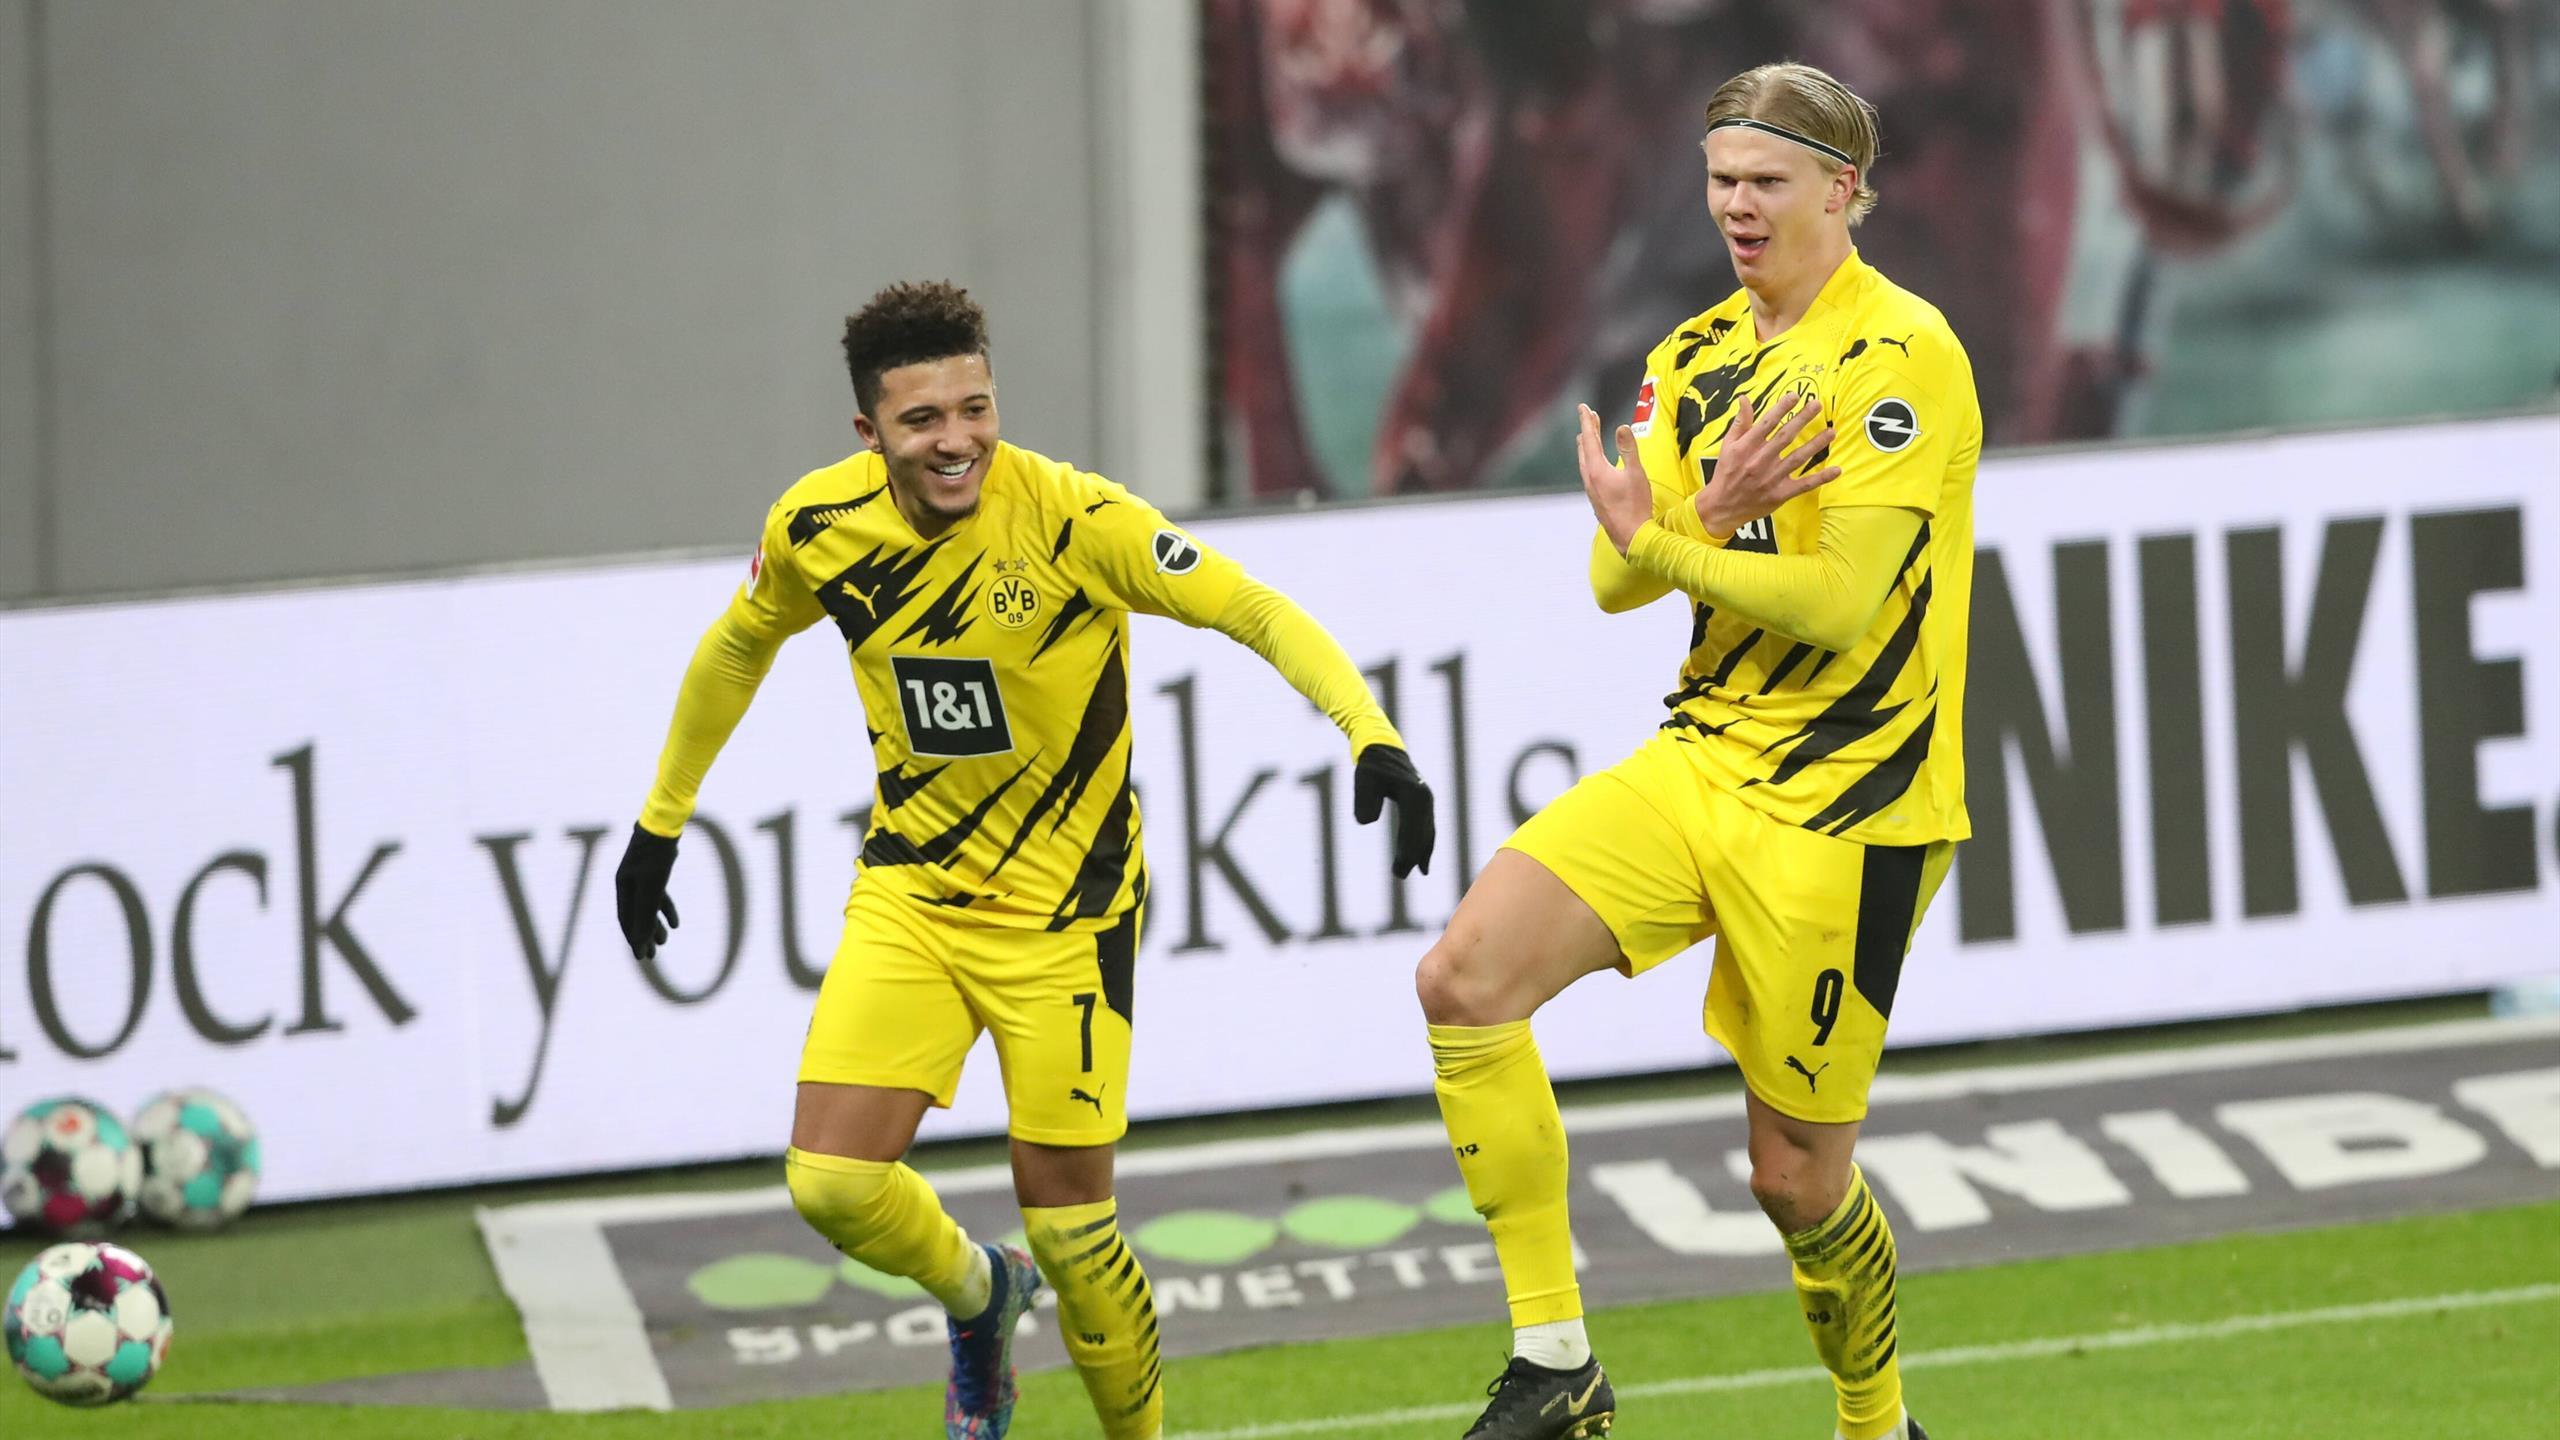 BVB - Talsohle durchschritten: Sanchos Aufschwung belebt Borussia Dortmund